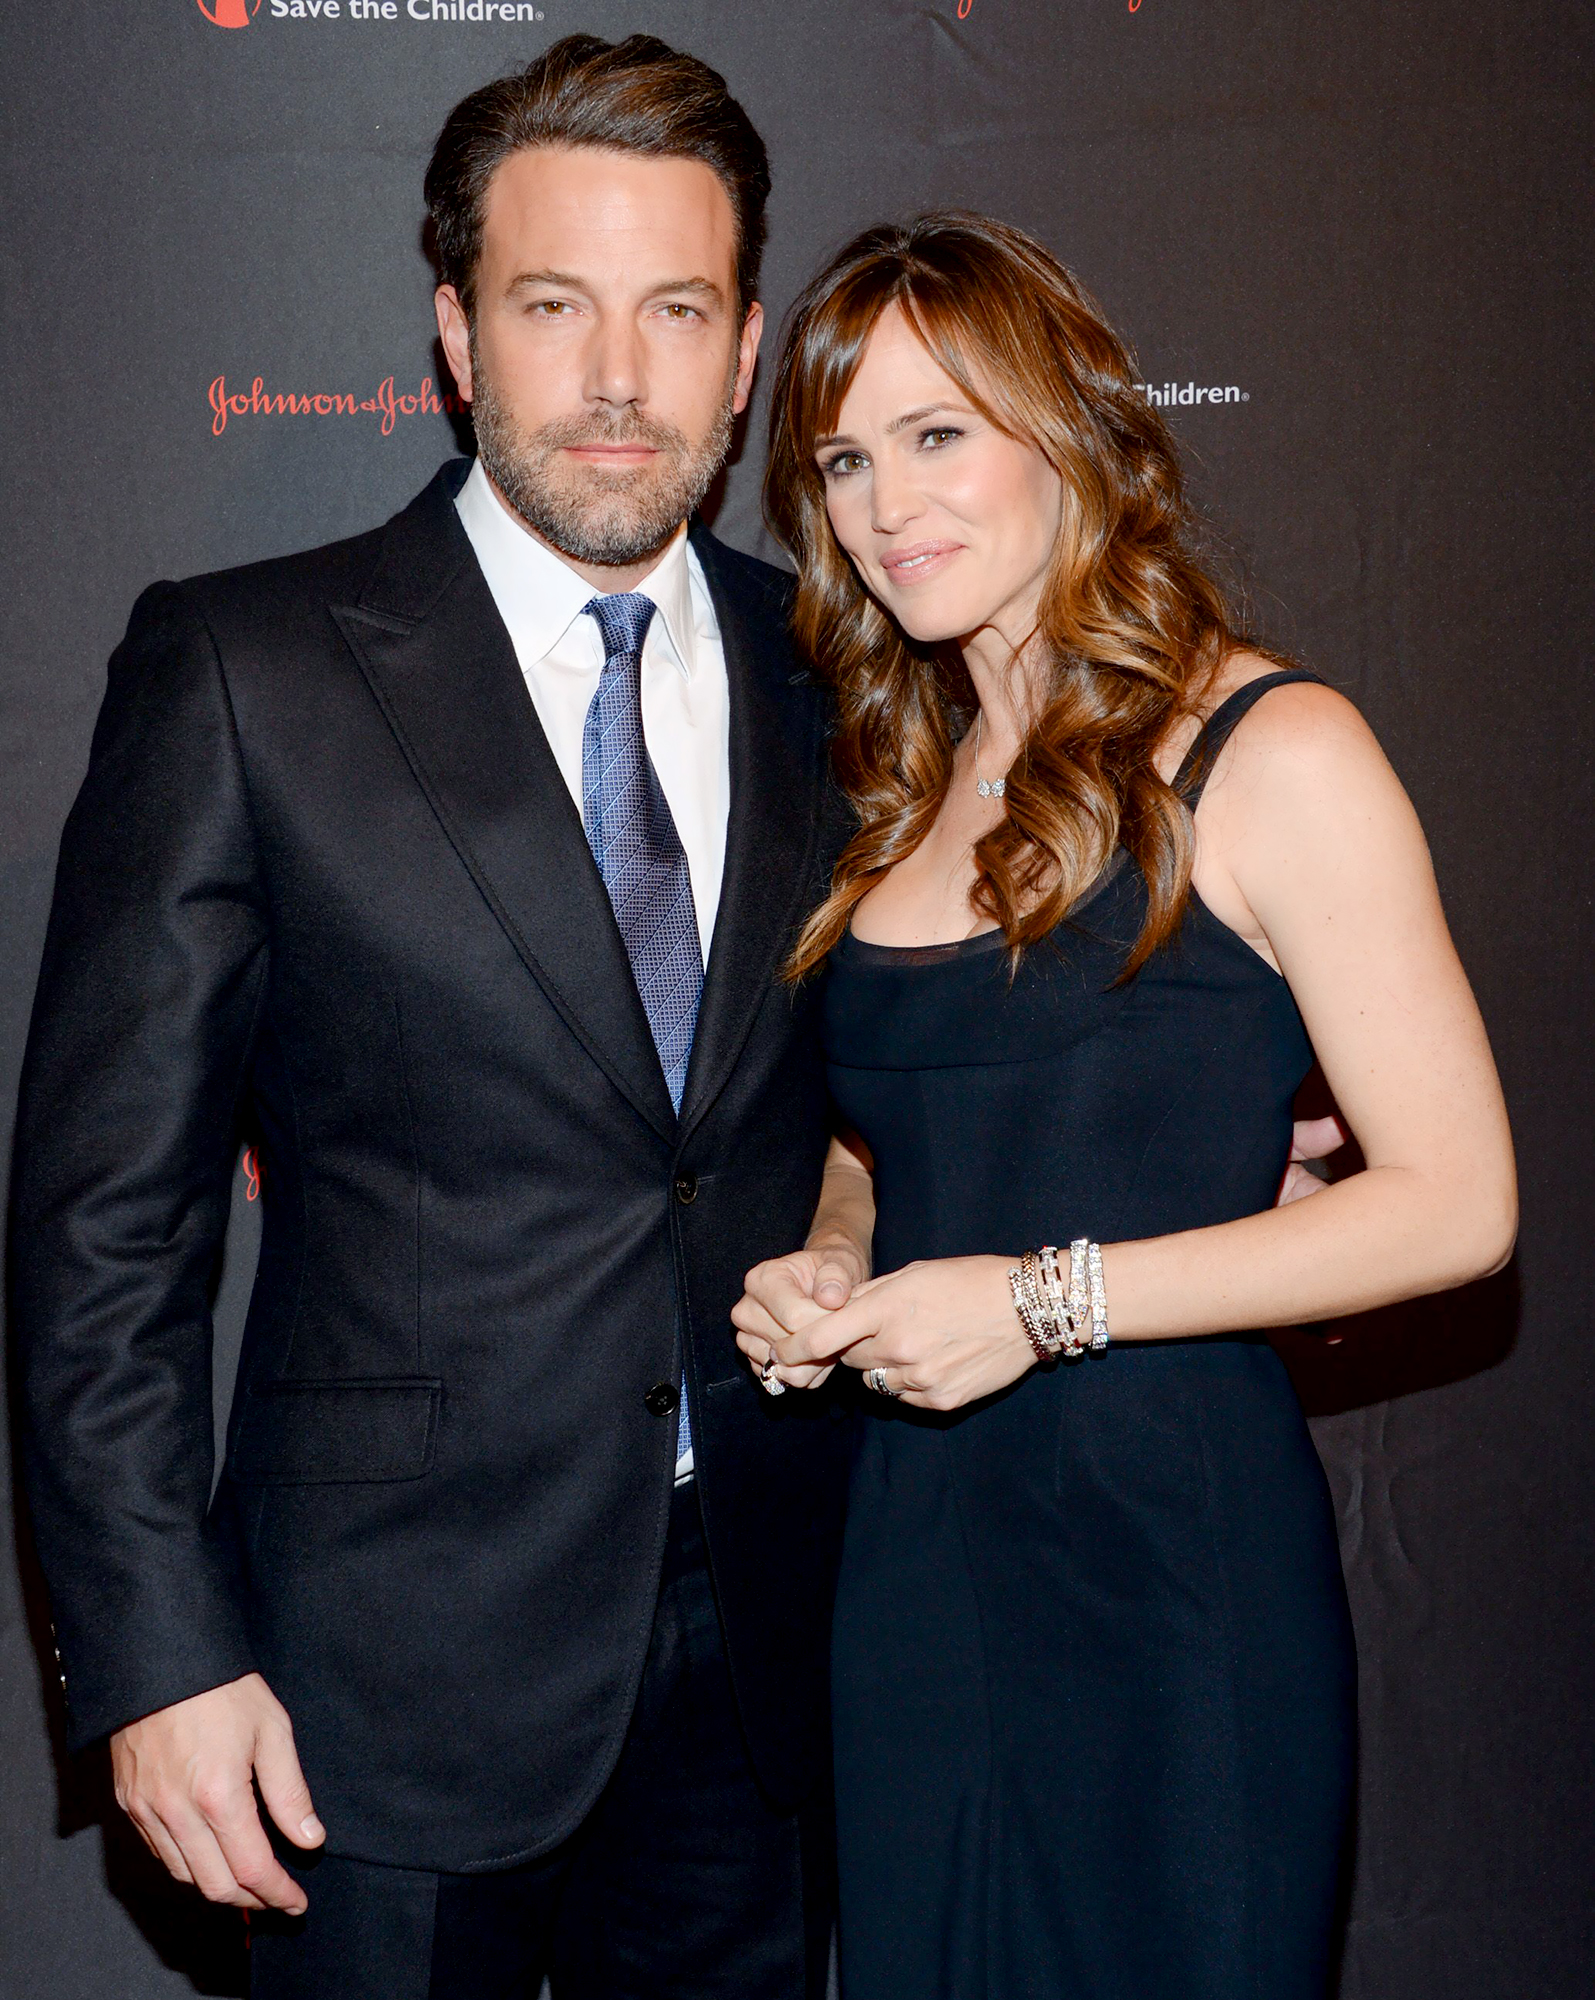 Ben-Affleck-Has-Utmost-Respect-for-Ex-Jennifer-Garner-Helping-Him-Through-Addiction